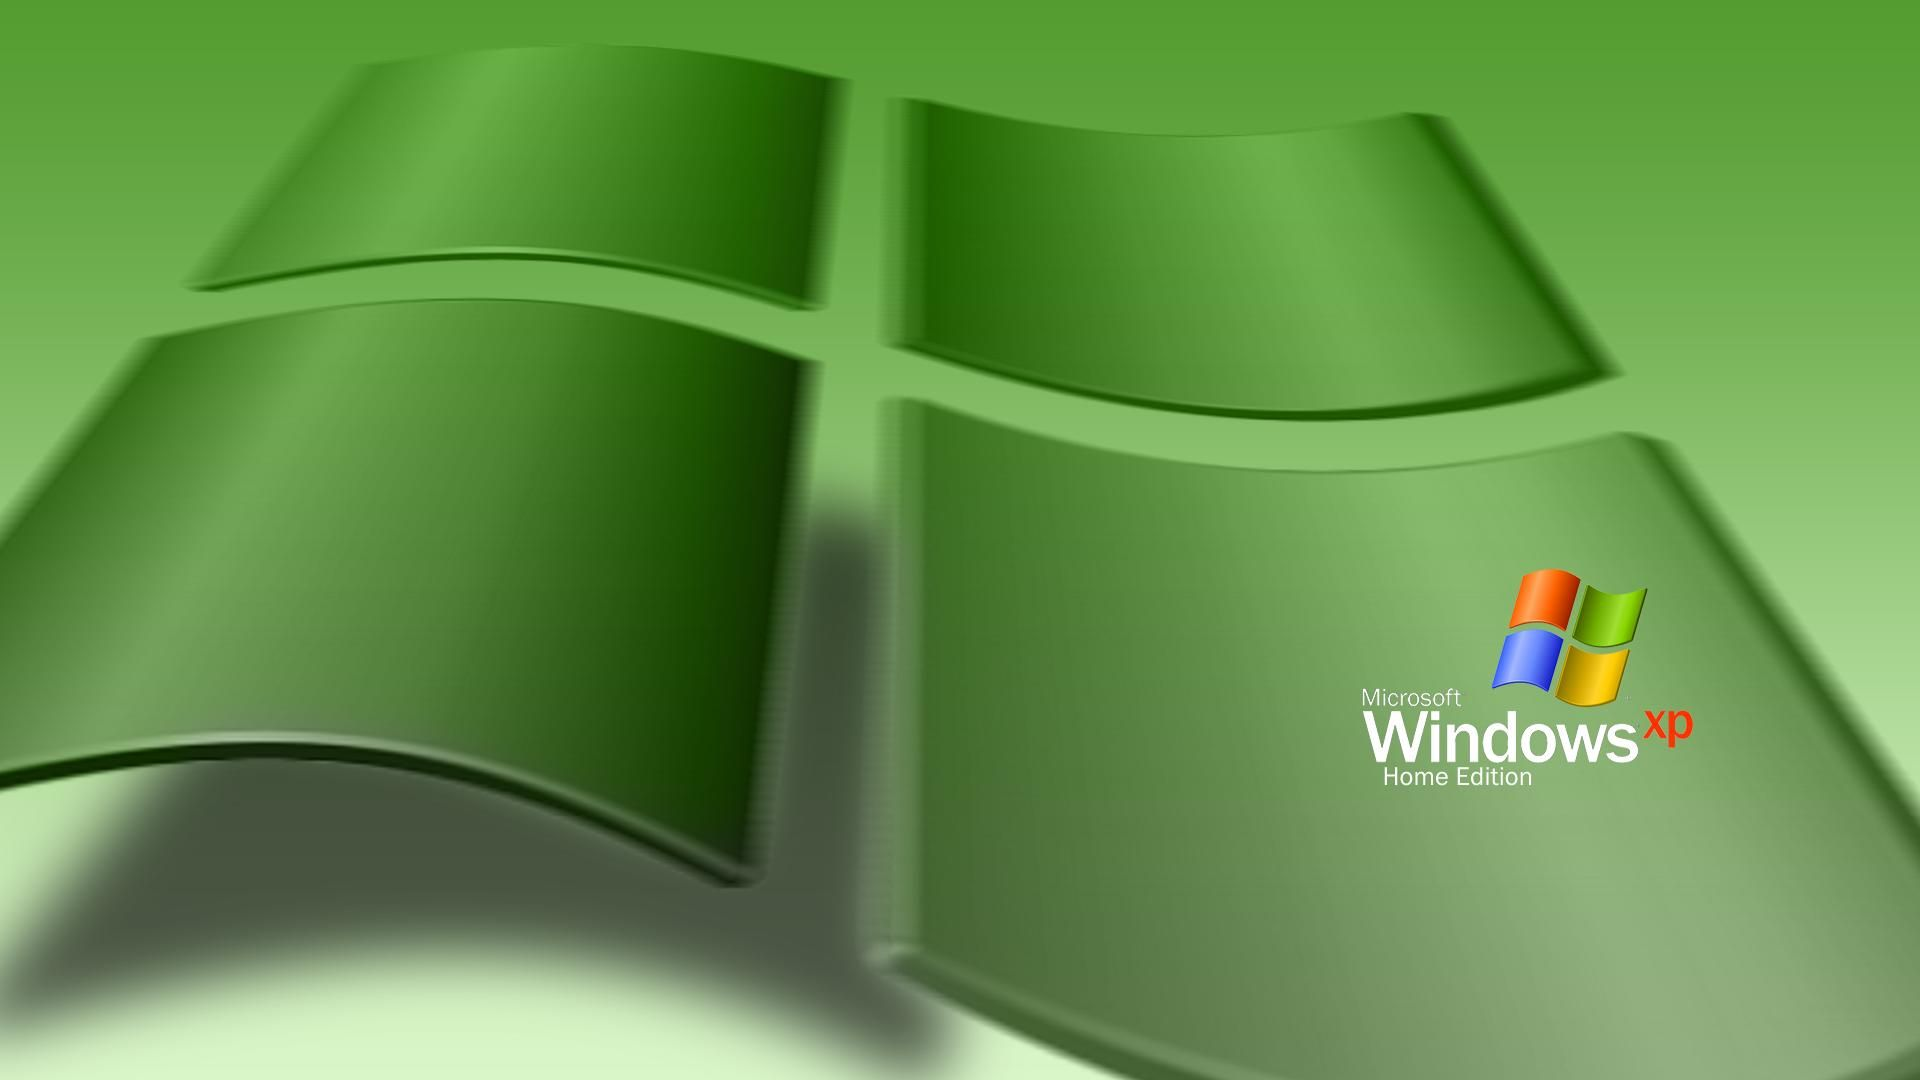 Windows XP Home Edition Wallpaper WallpaperSafari